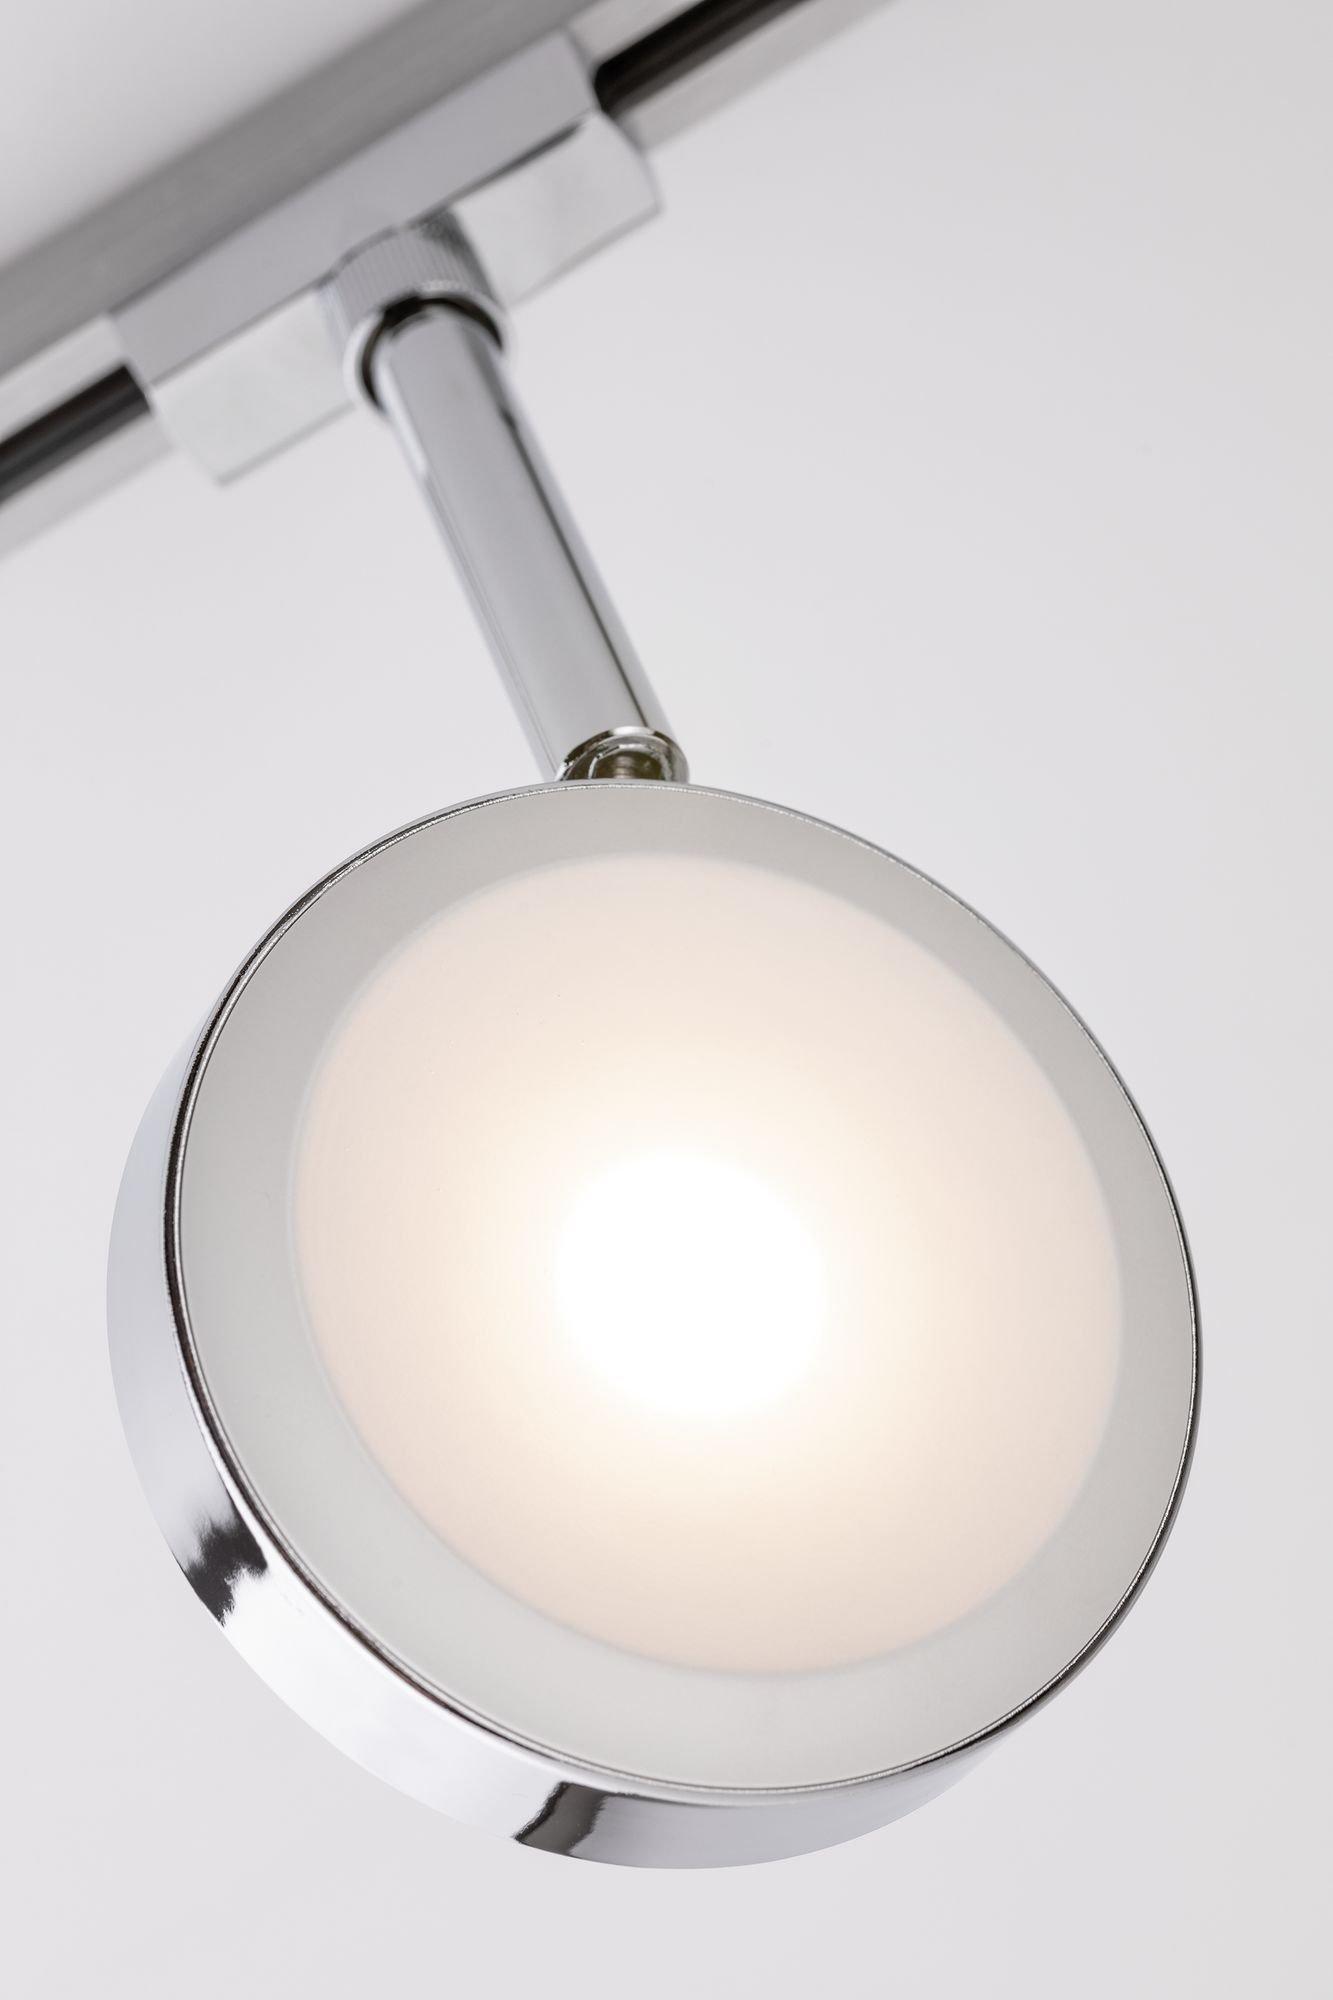 VariLine LED Spot Discus 5W Chrom matt/Chrom